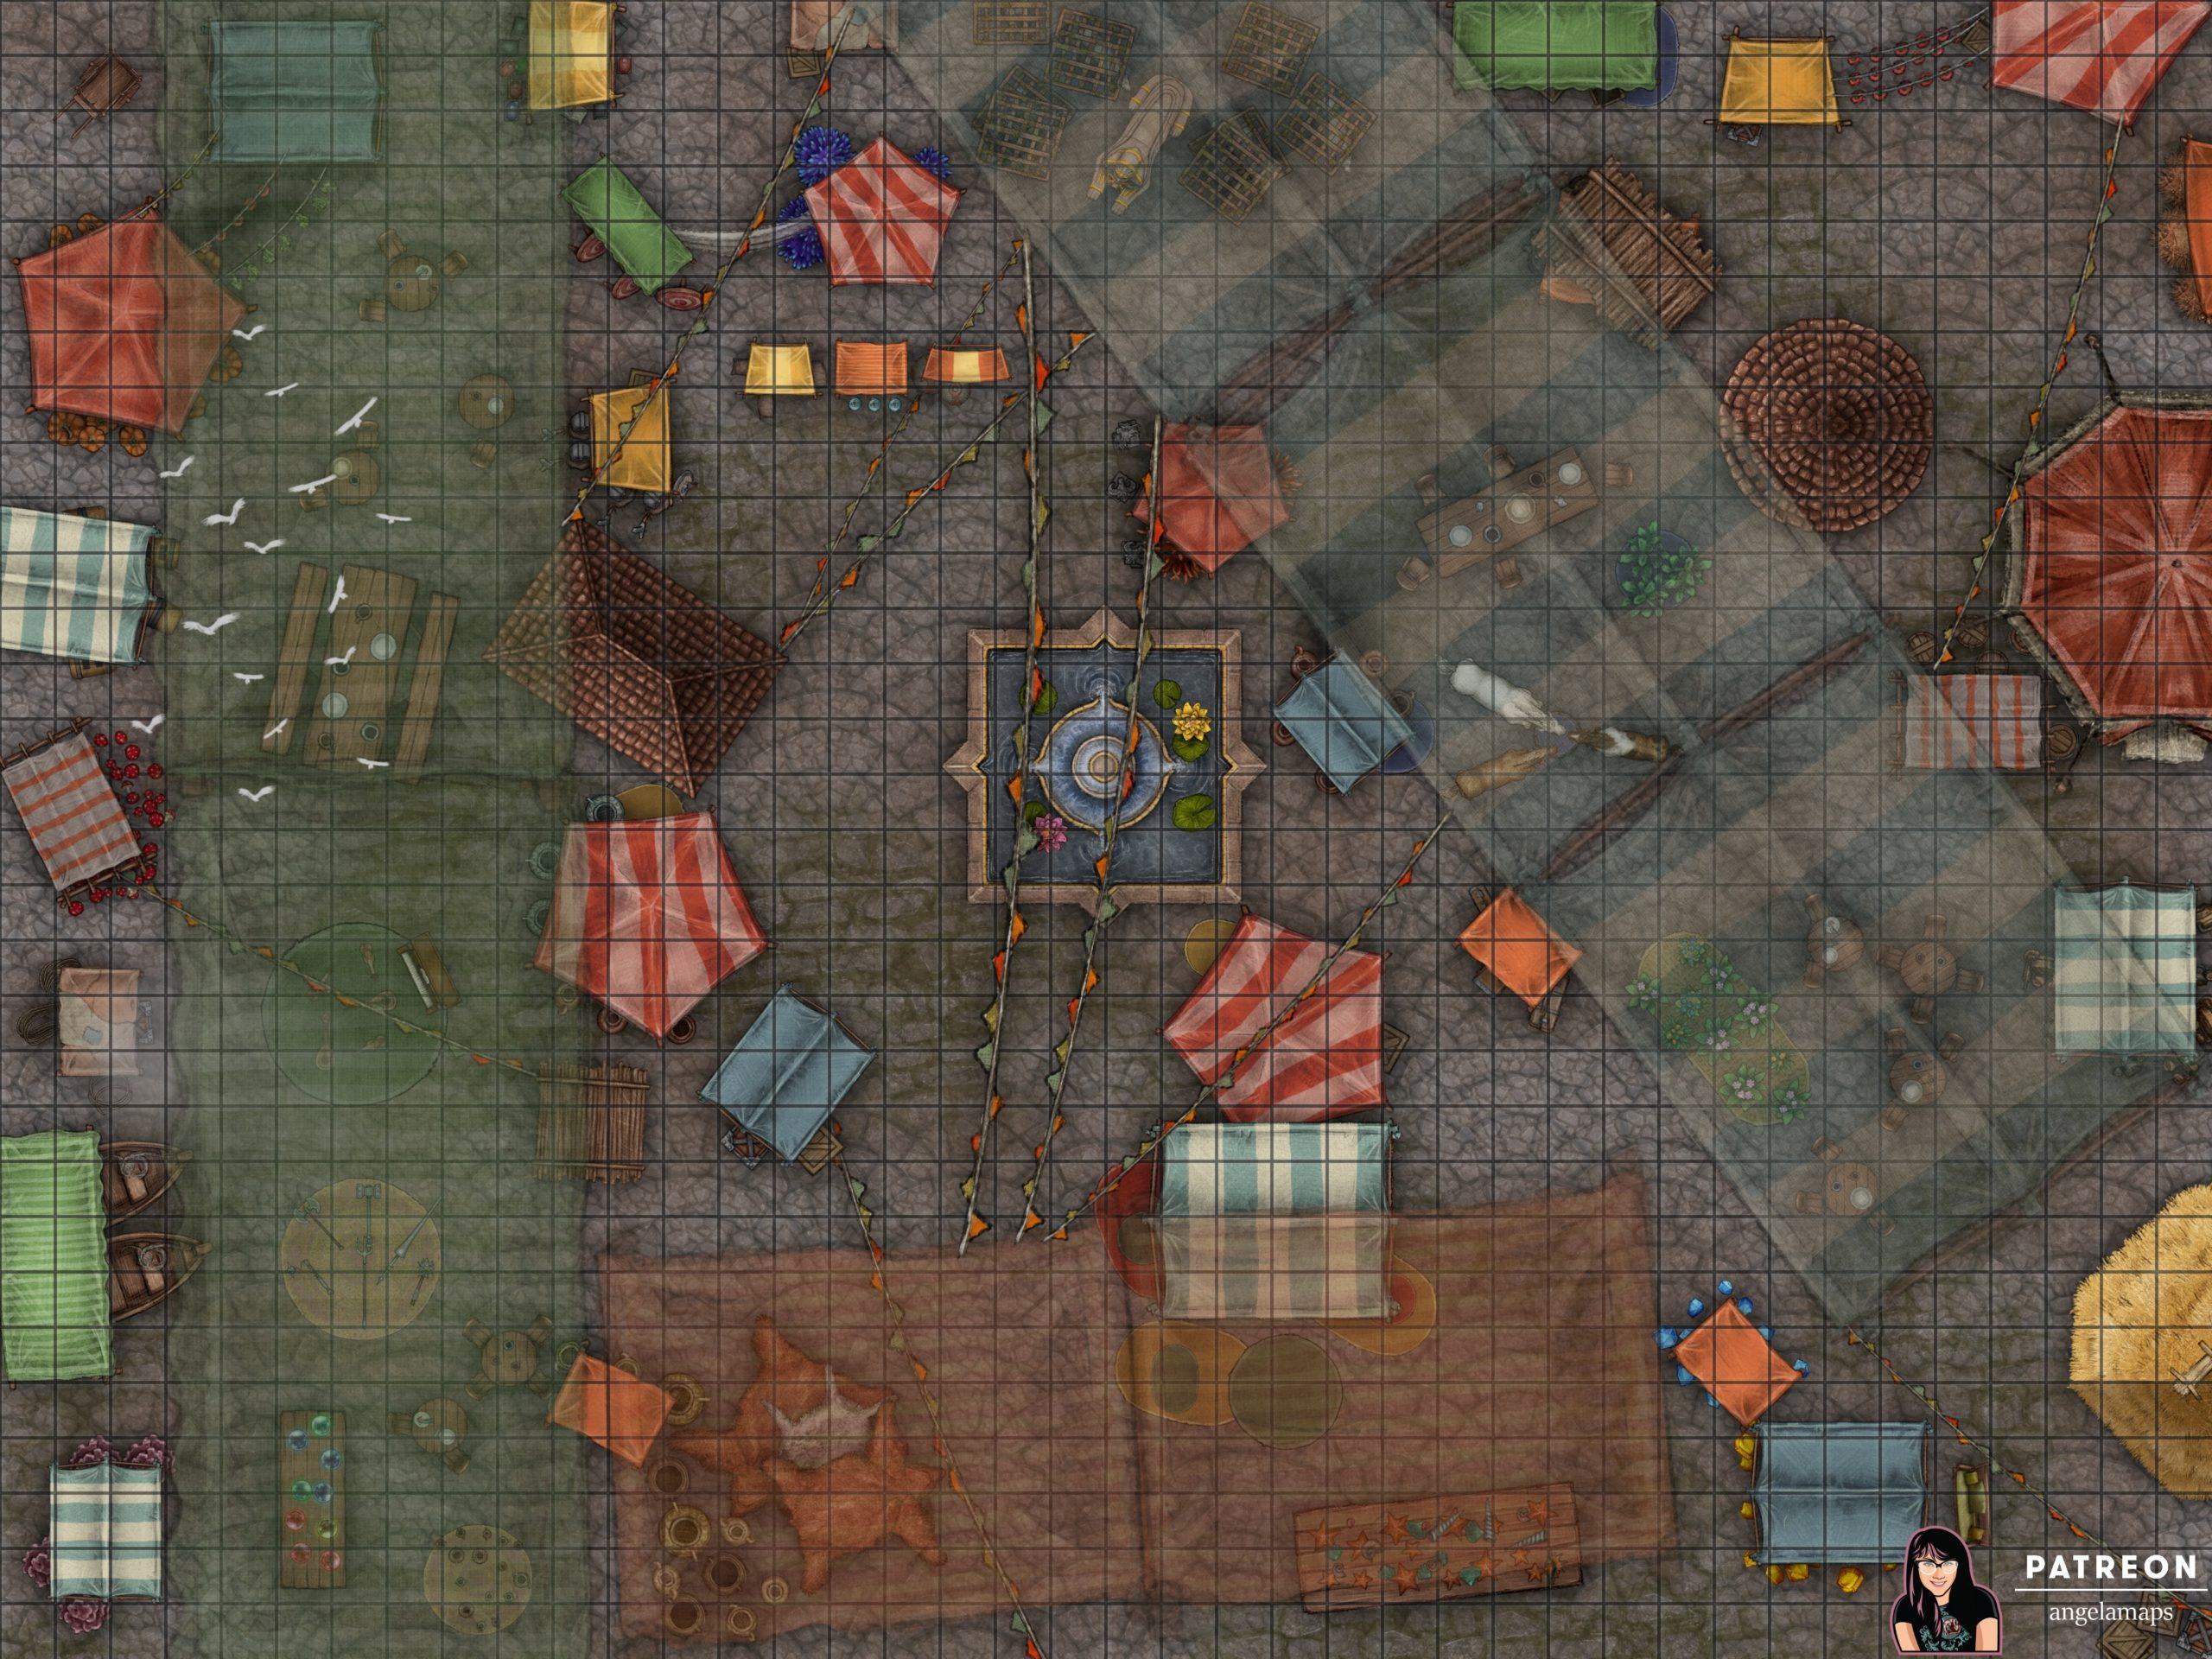 Great Bazaar battle map encounter at an outdoor market place for D&D or Pathfinder TTRPGs